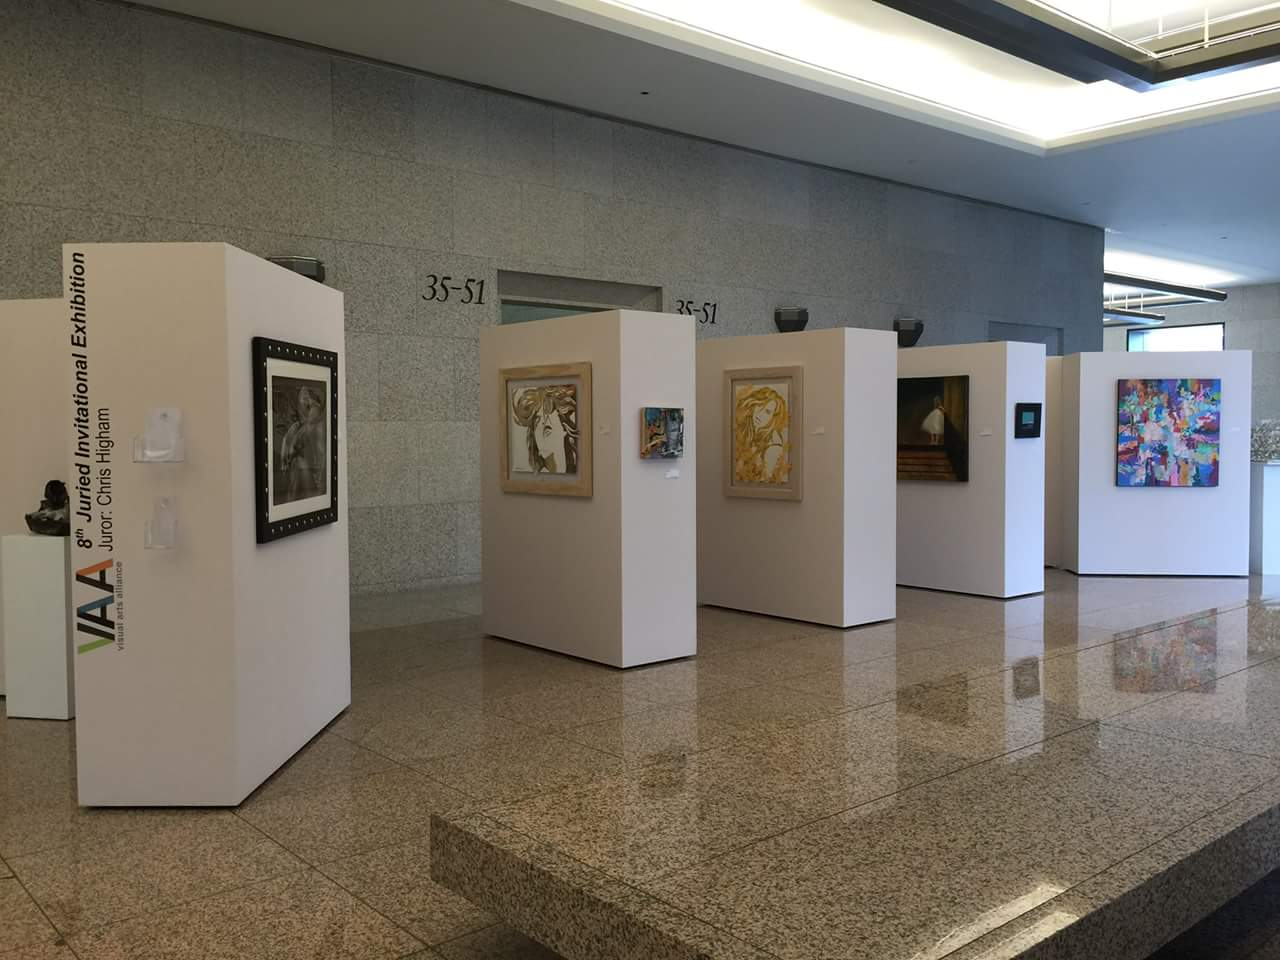 Visual Arts Alliance VAA 8th Juried Invitational Exhibition with Marcy Ann Villafana